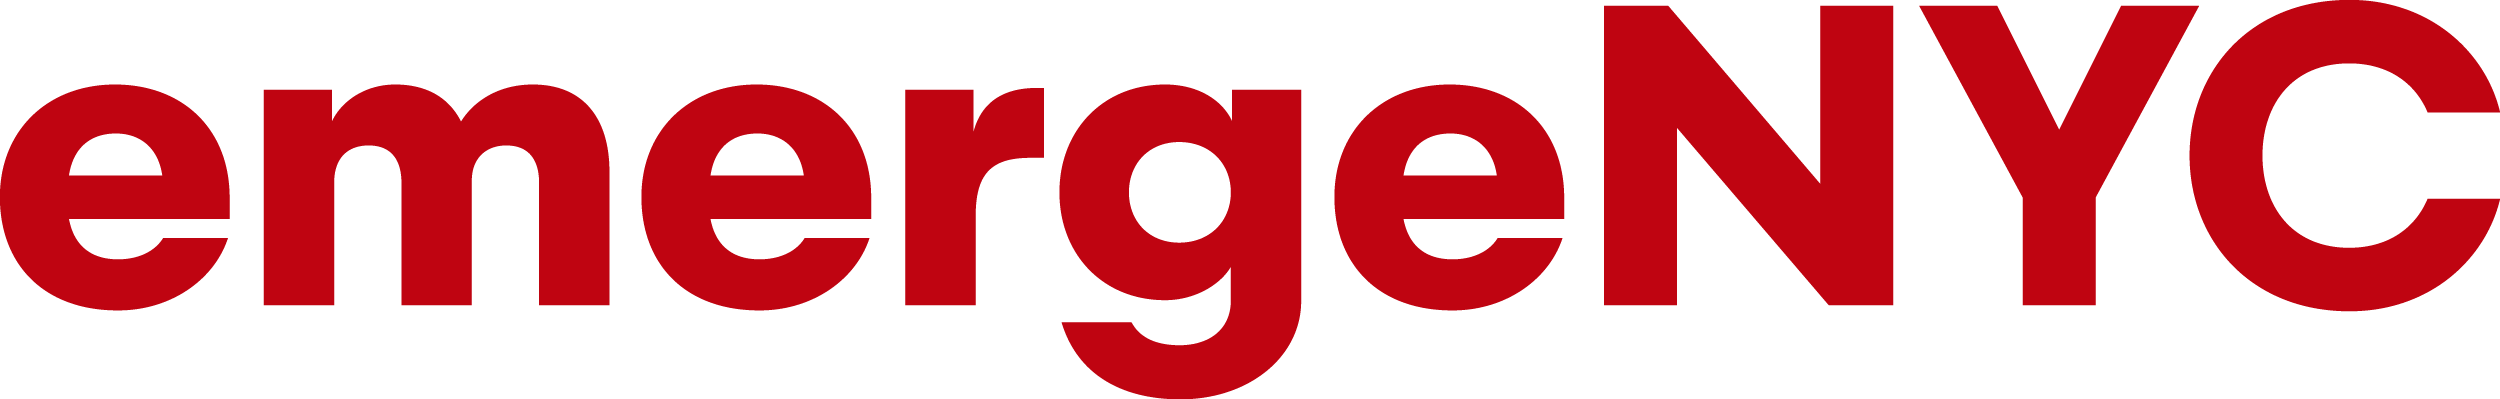 emergenyc-logo-rojo-2020